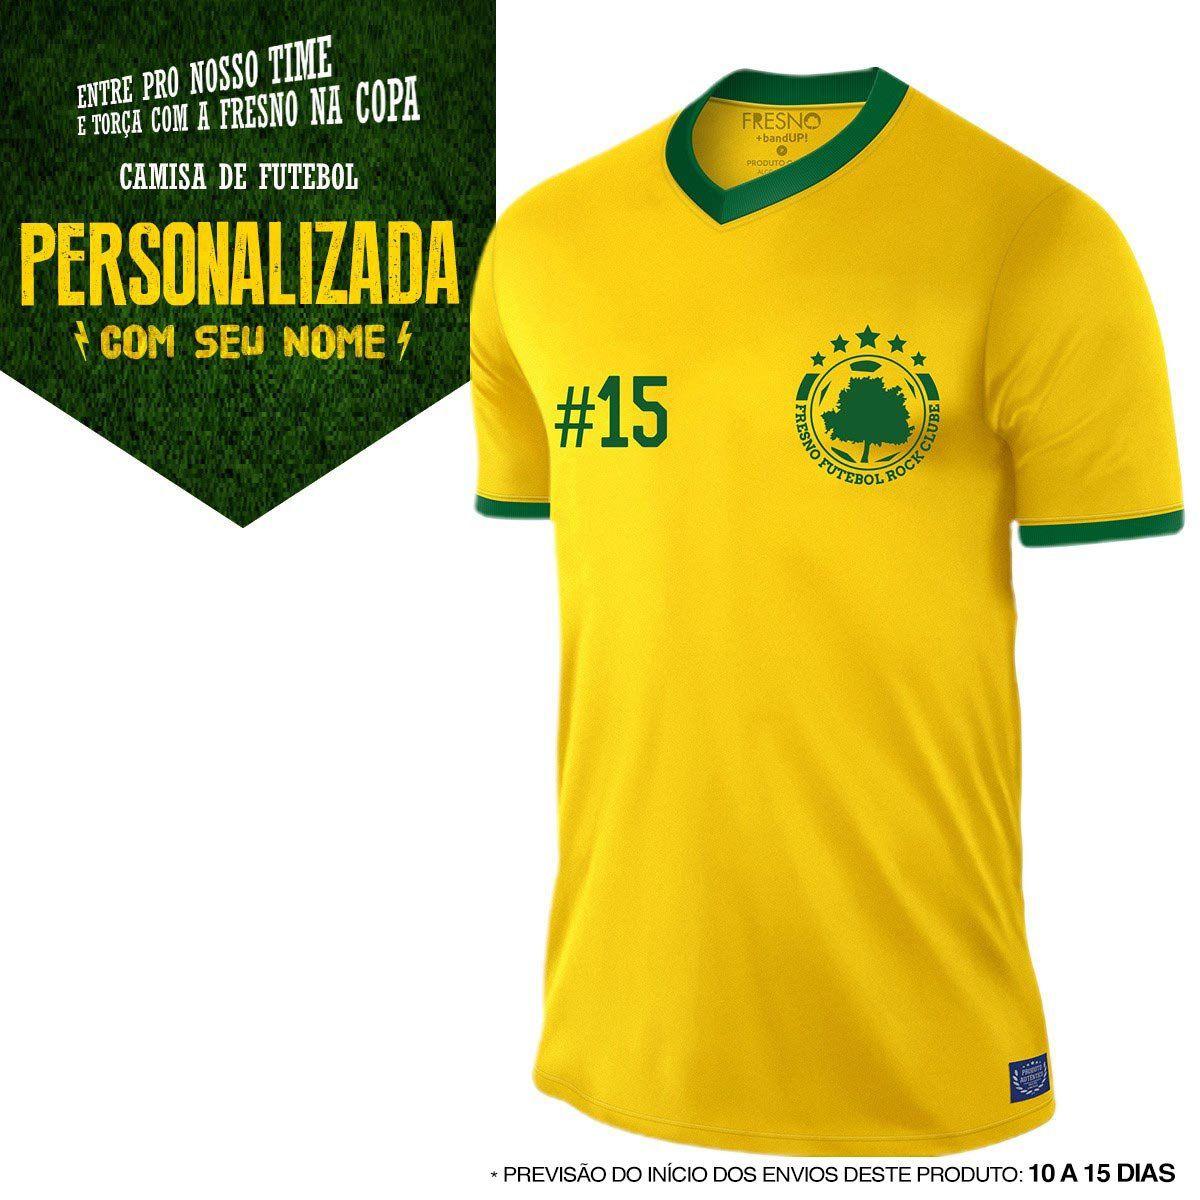 Camisa Fresno - Futebol Rock Clube